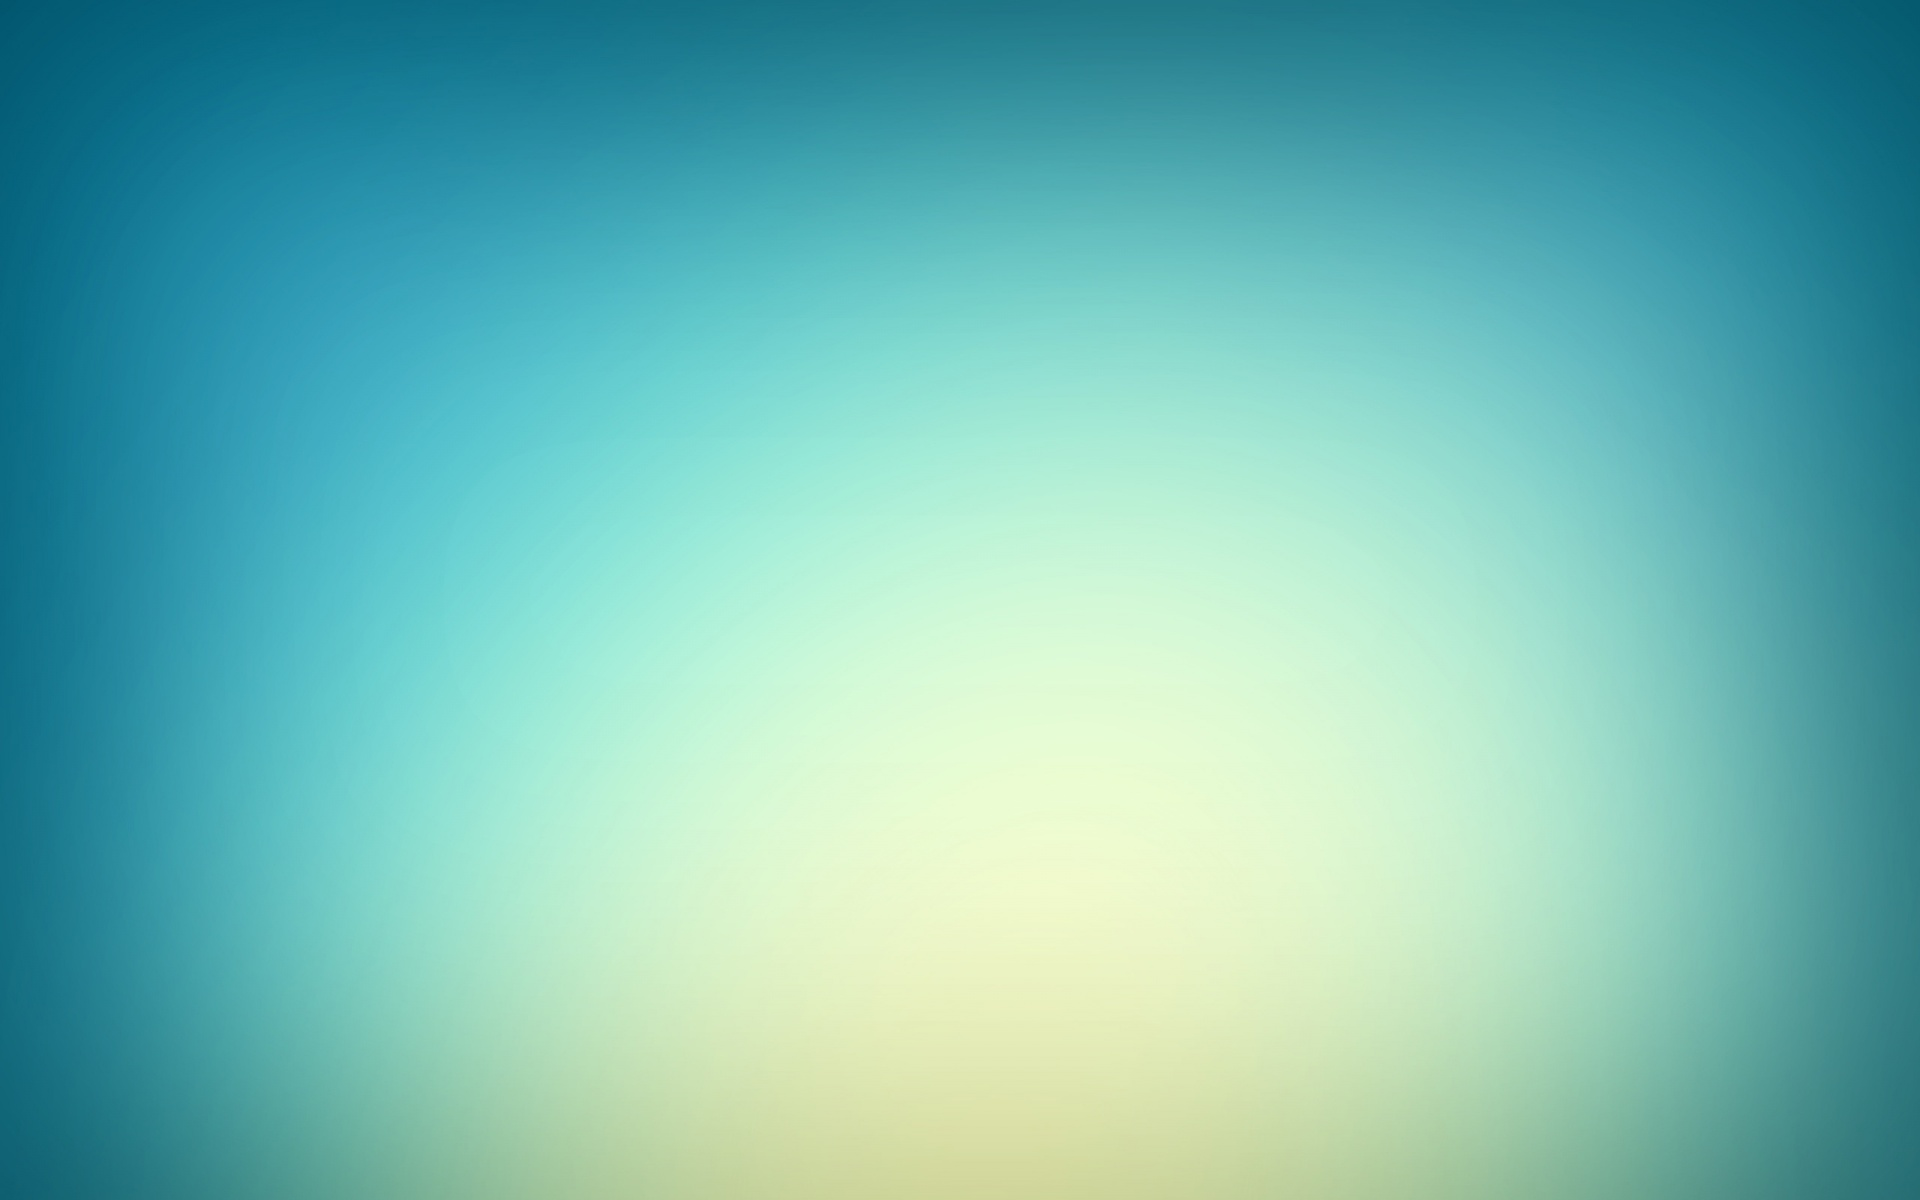 Blue And White Wallpaper - WallpaperSafari